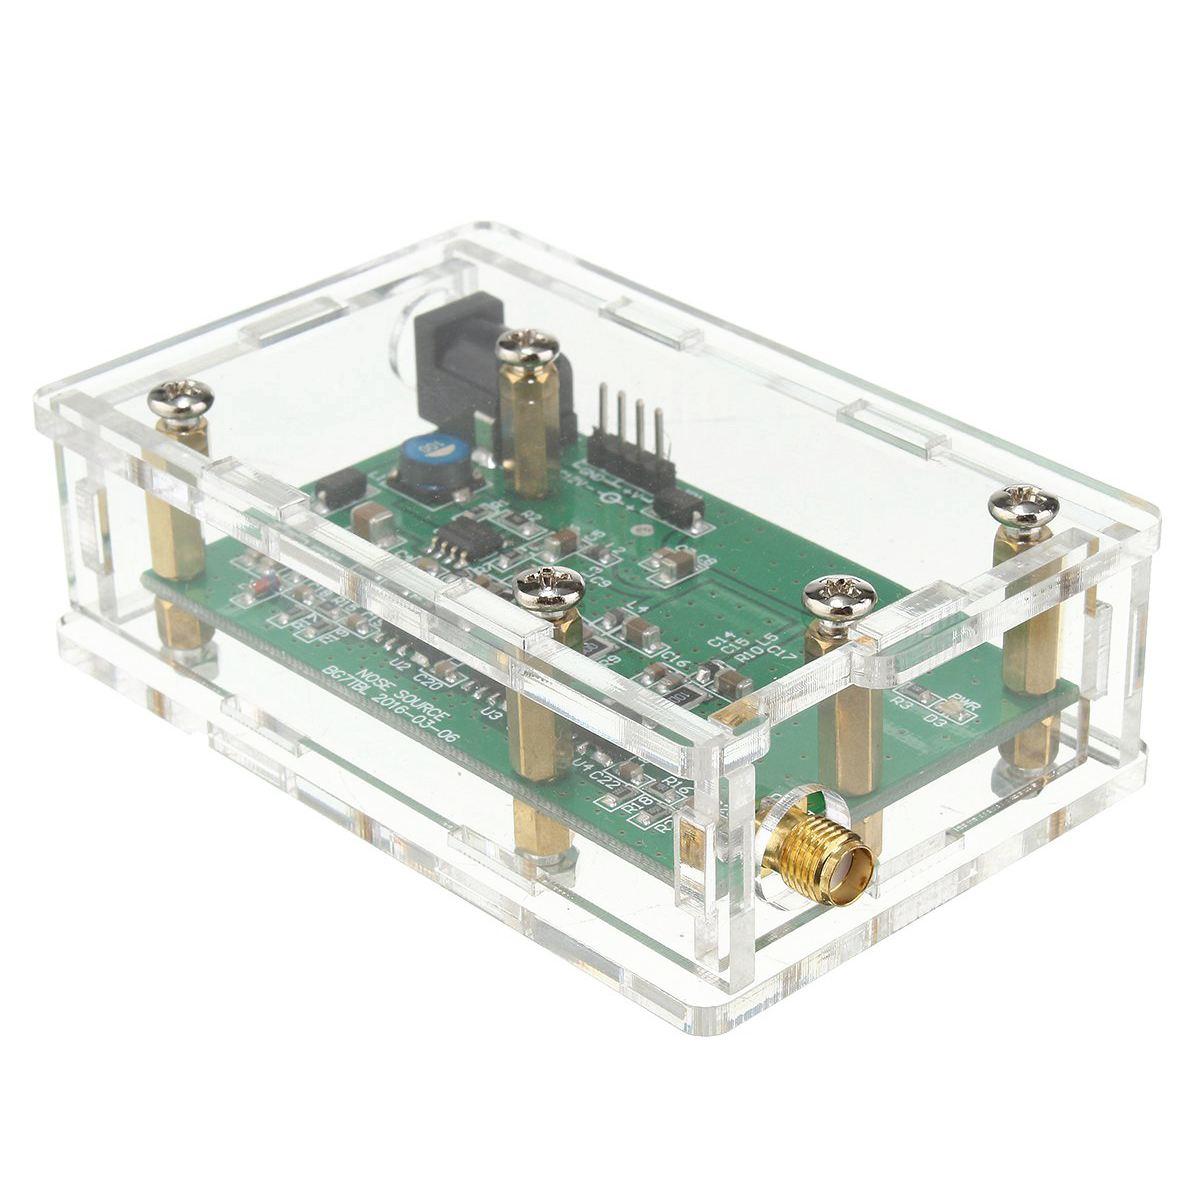 THGS Noise Source Simple Spectrum External Generator Tracking SMA Source + Case цена 2017